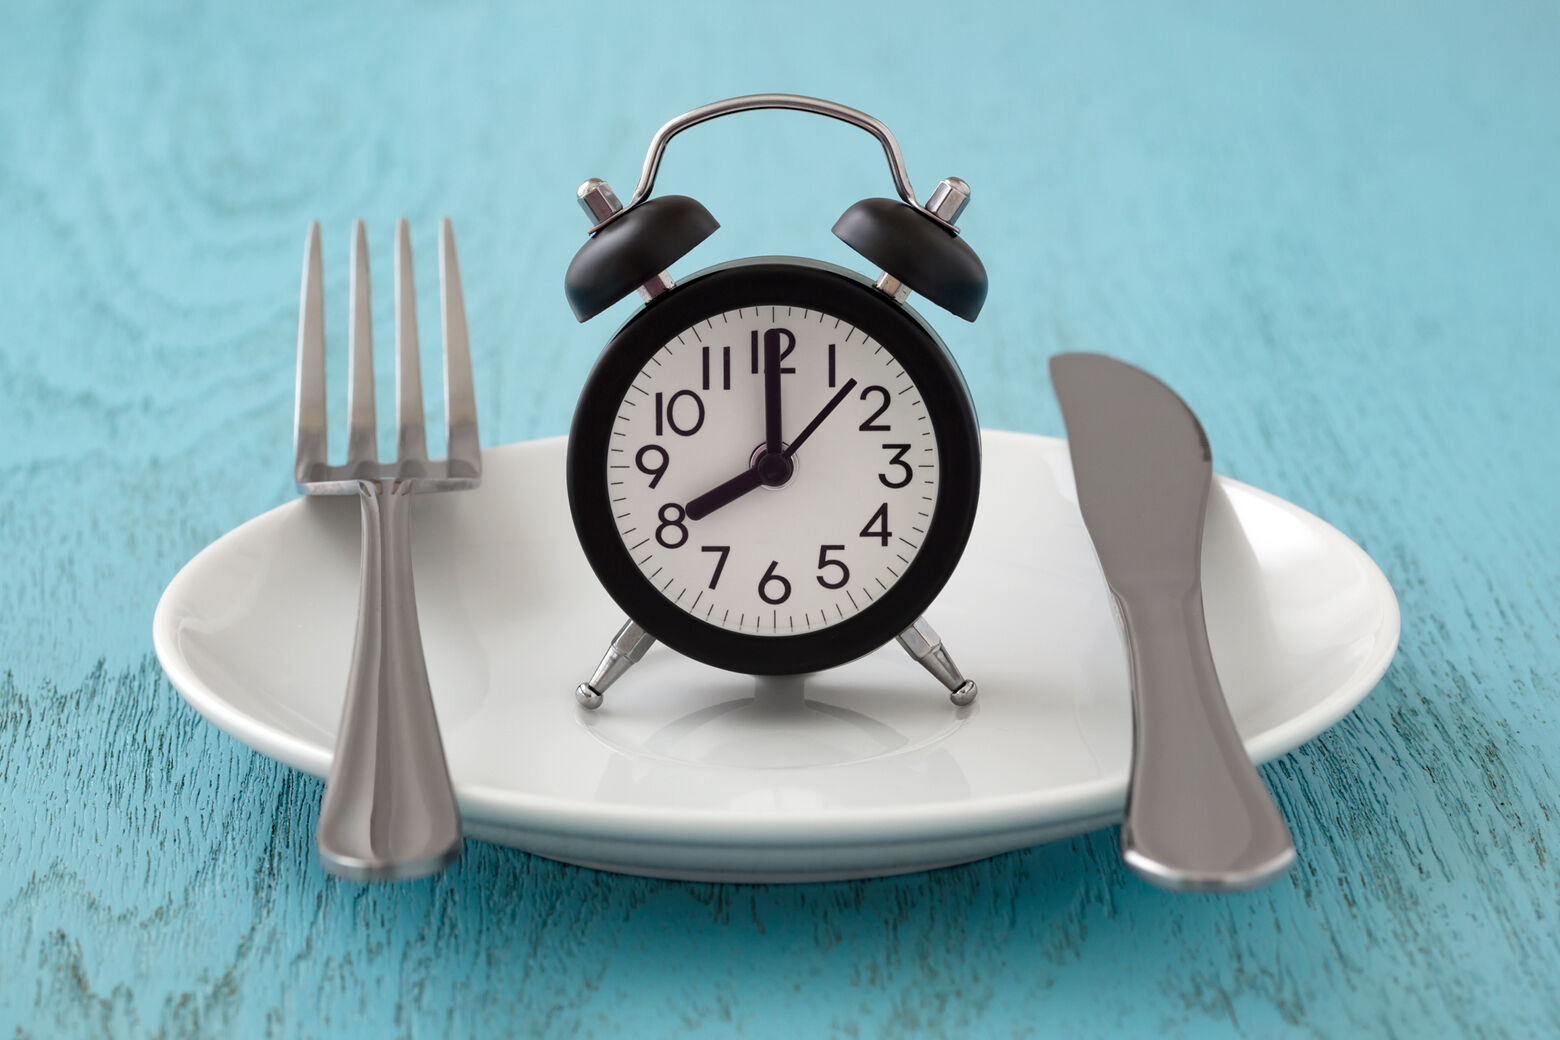 Fasting, environment